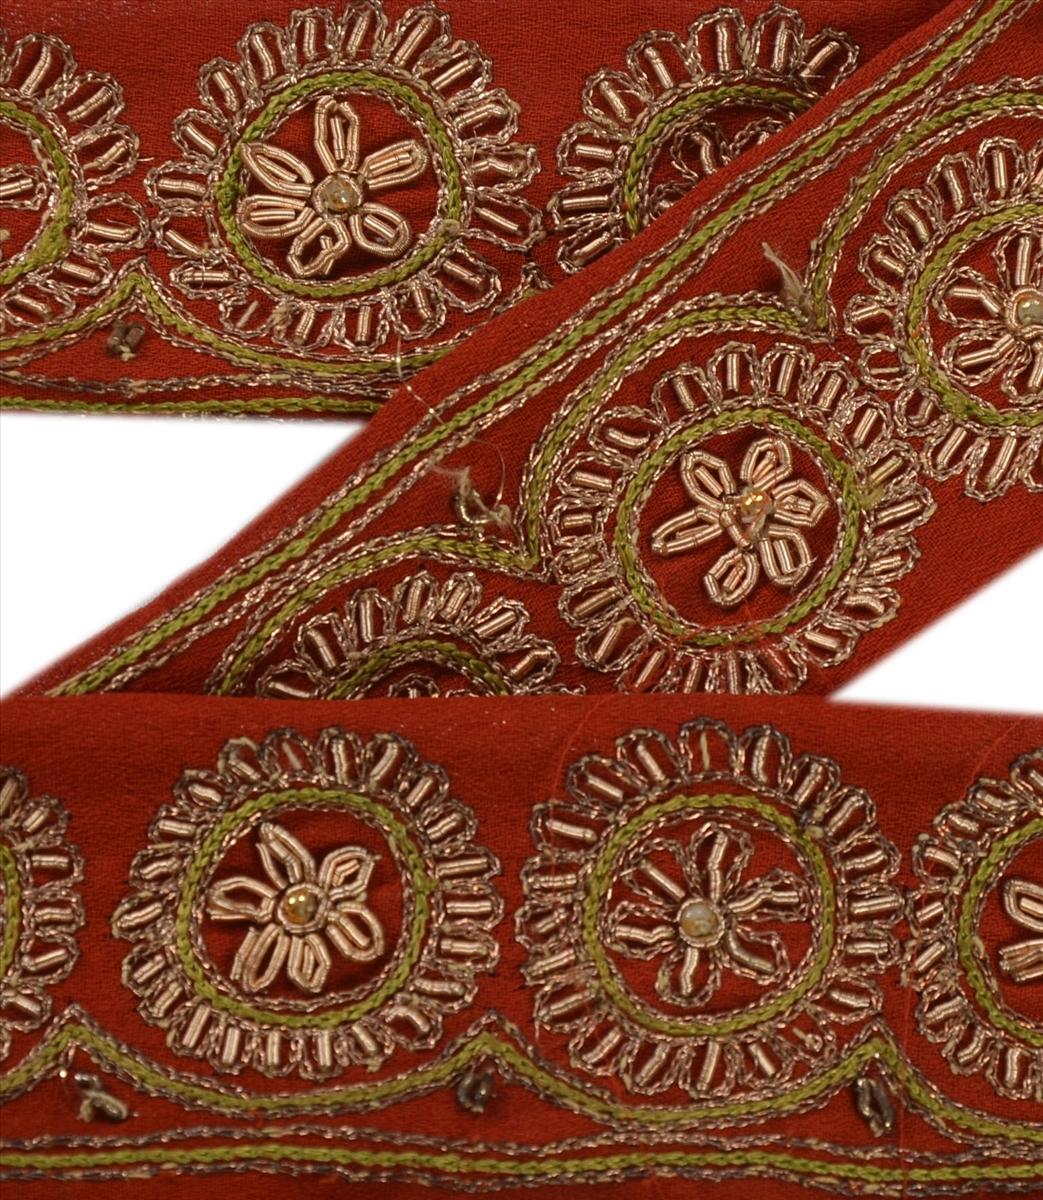 Sanskriti Vintage Sari Border Craft Blue Trim Hand Embroidered Sewing Lace